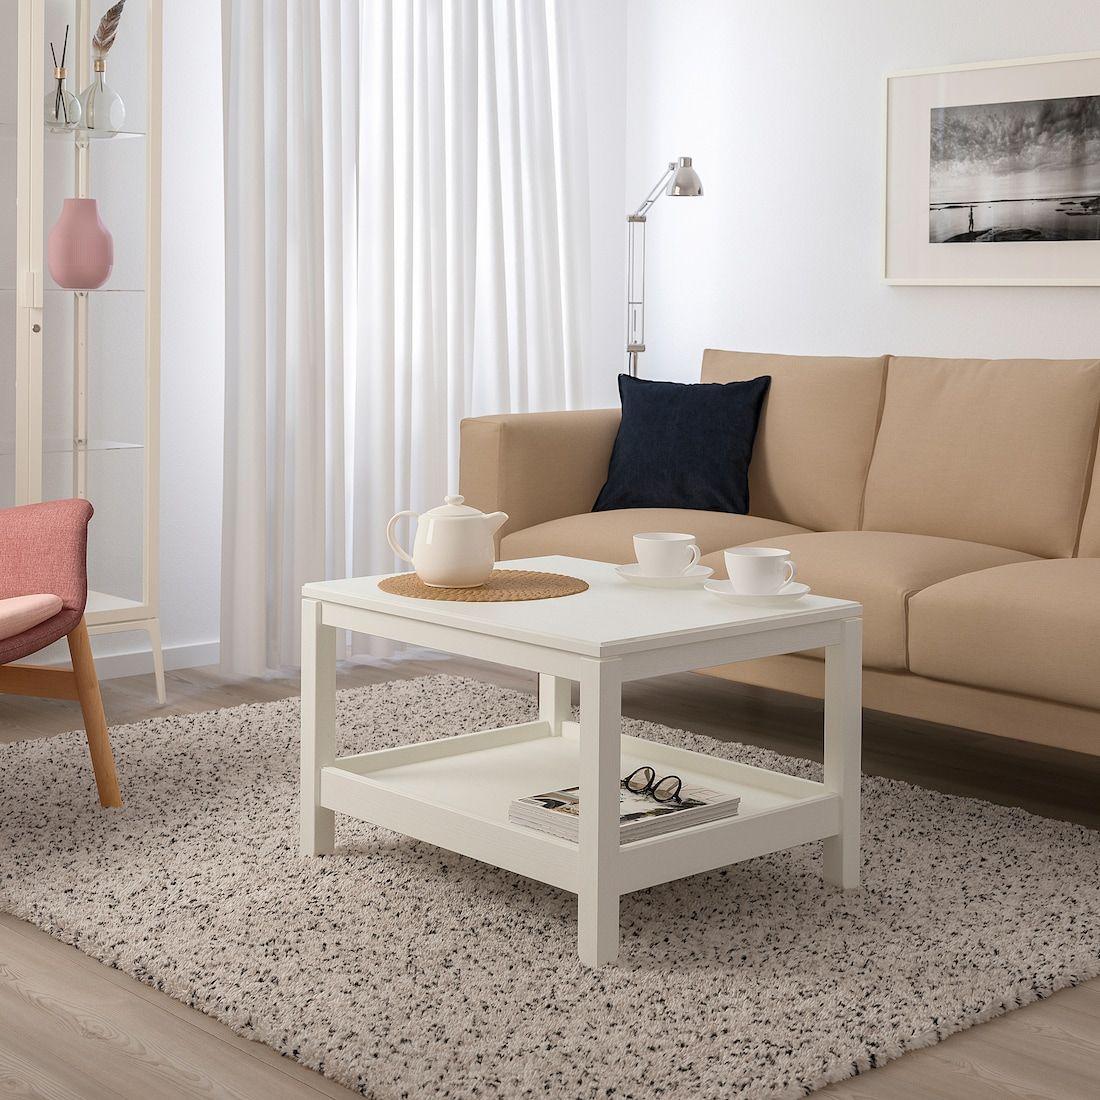 HAVSTA Coffee table - white (CA) - IKEA in 2020 | Coffee ...